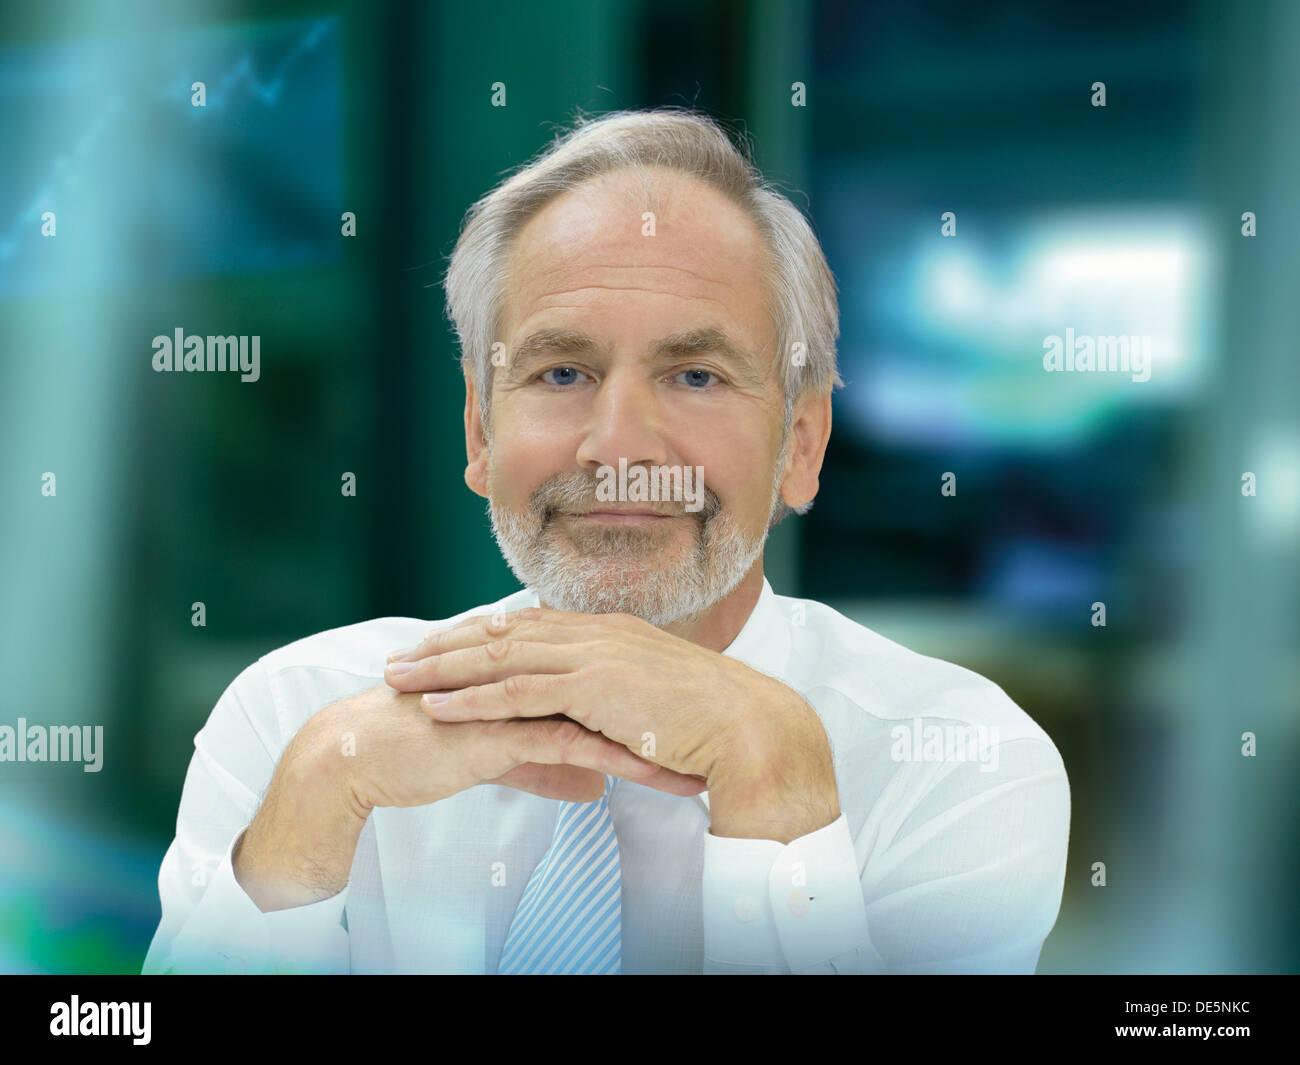 Businessman, senior, optimistic and happy expression - Stock Image